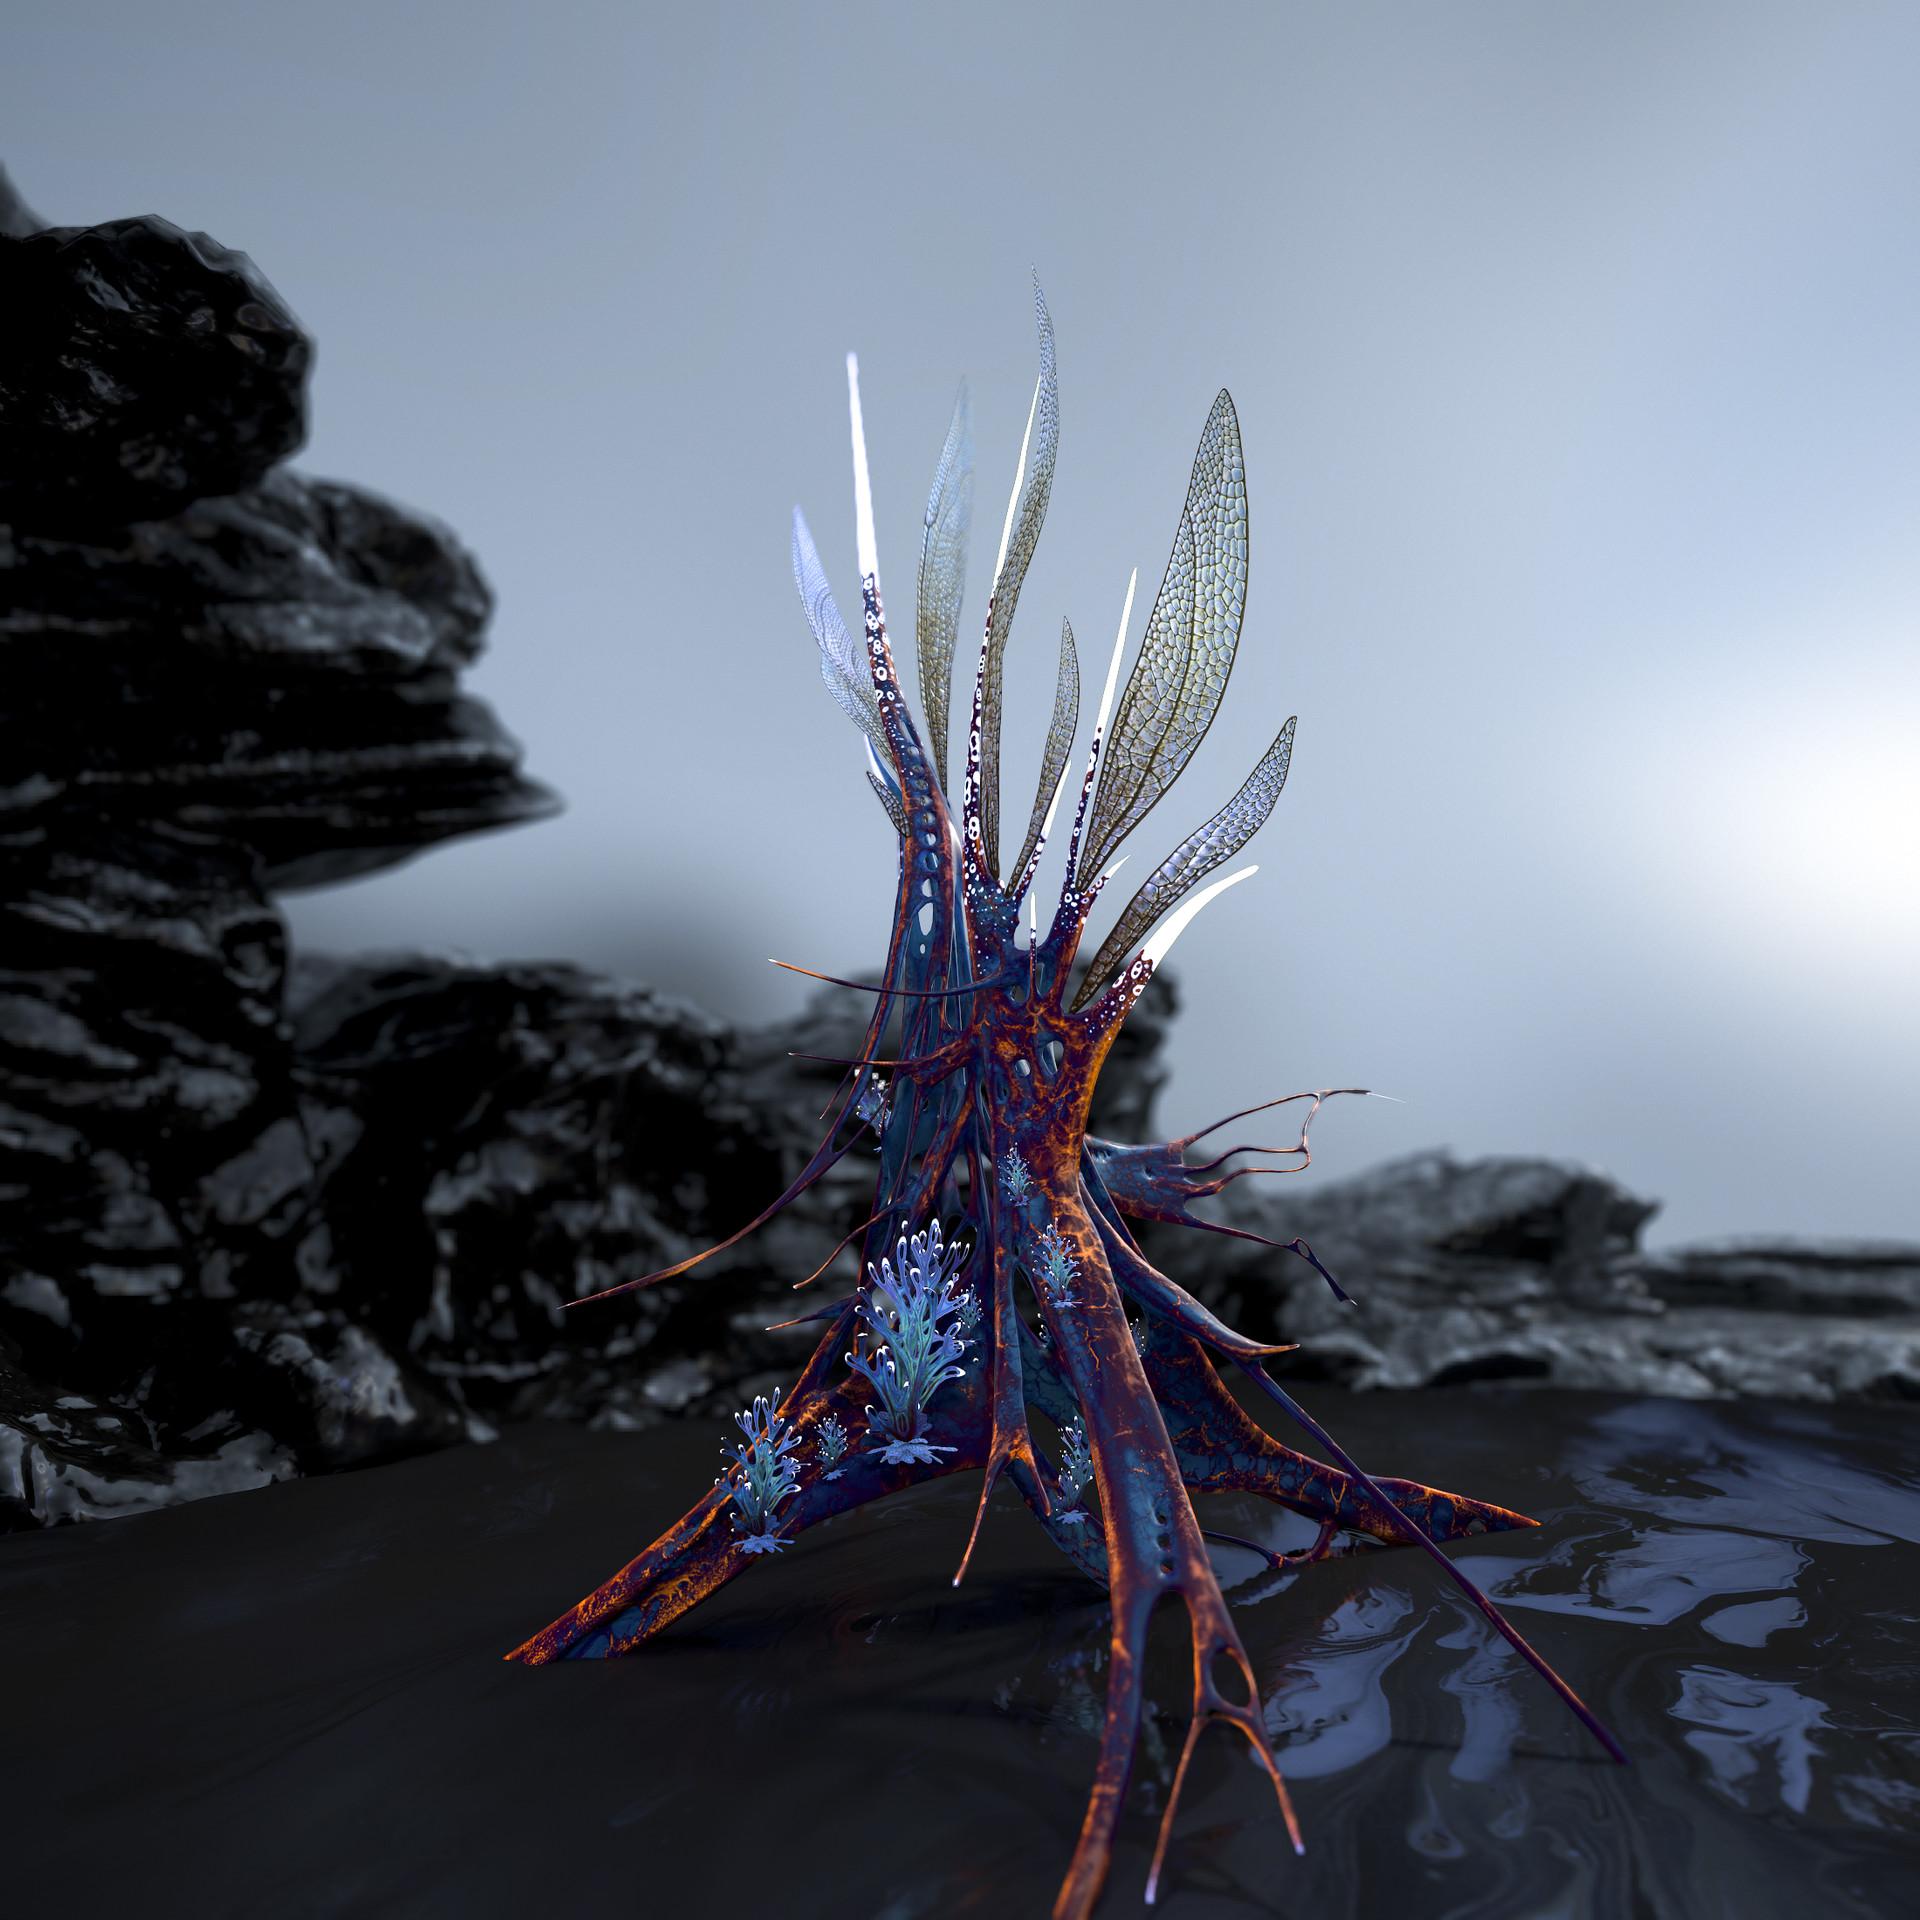 Johan de leenheer alien fern misota spletinus2